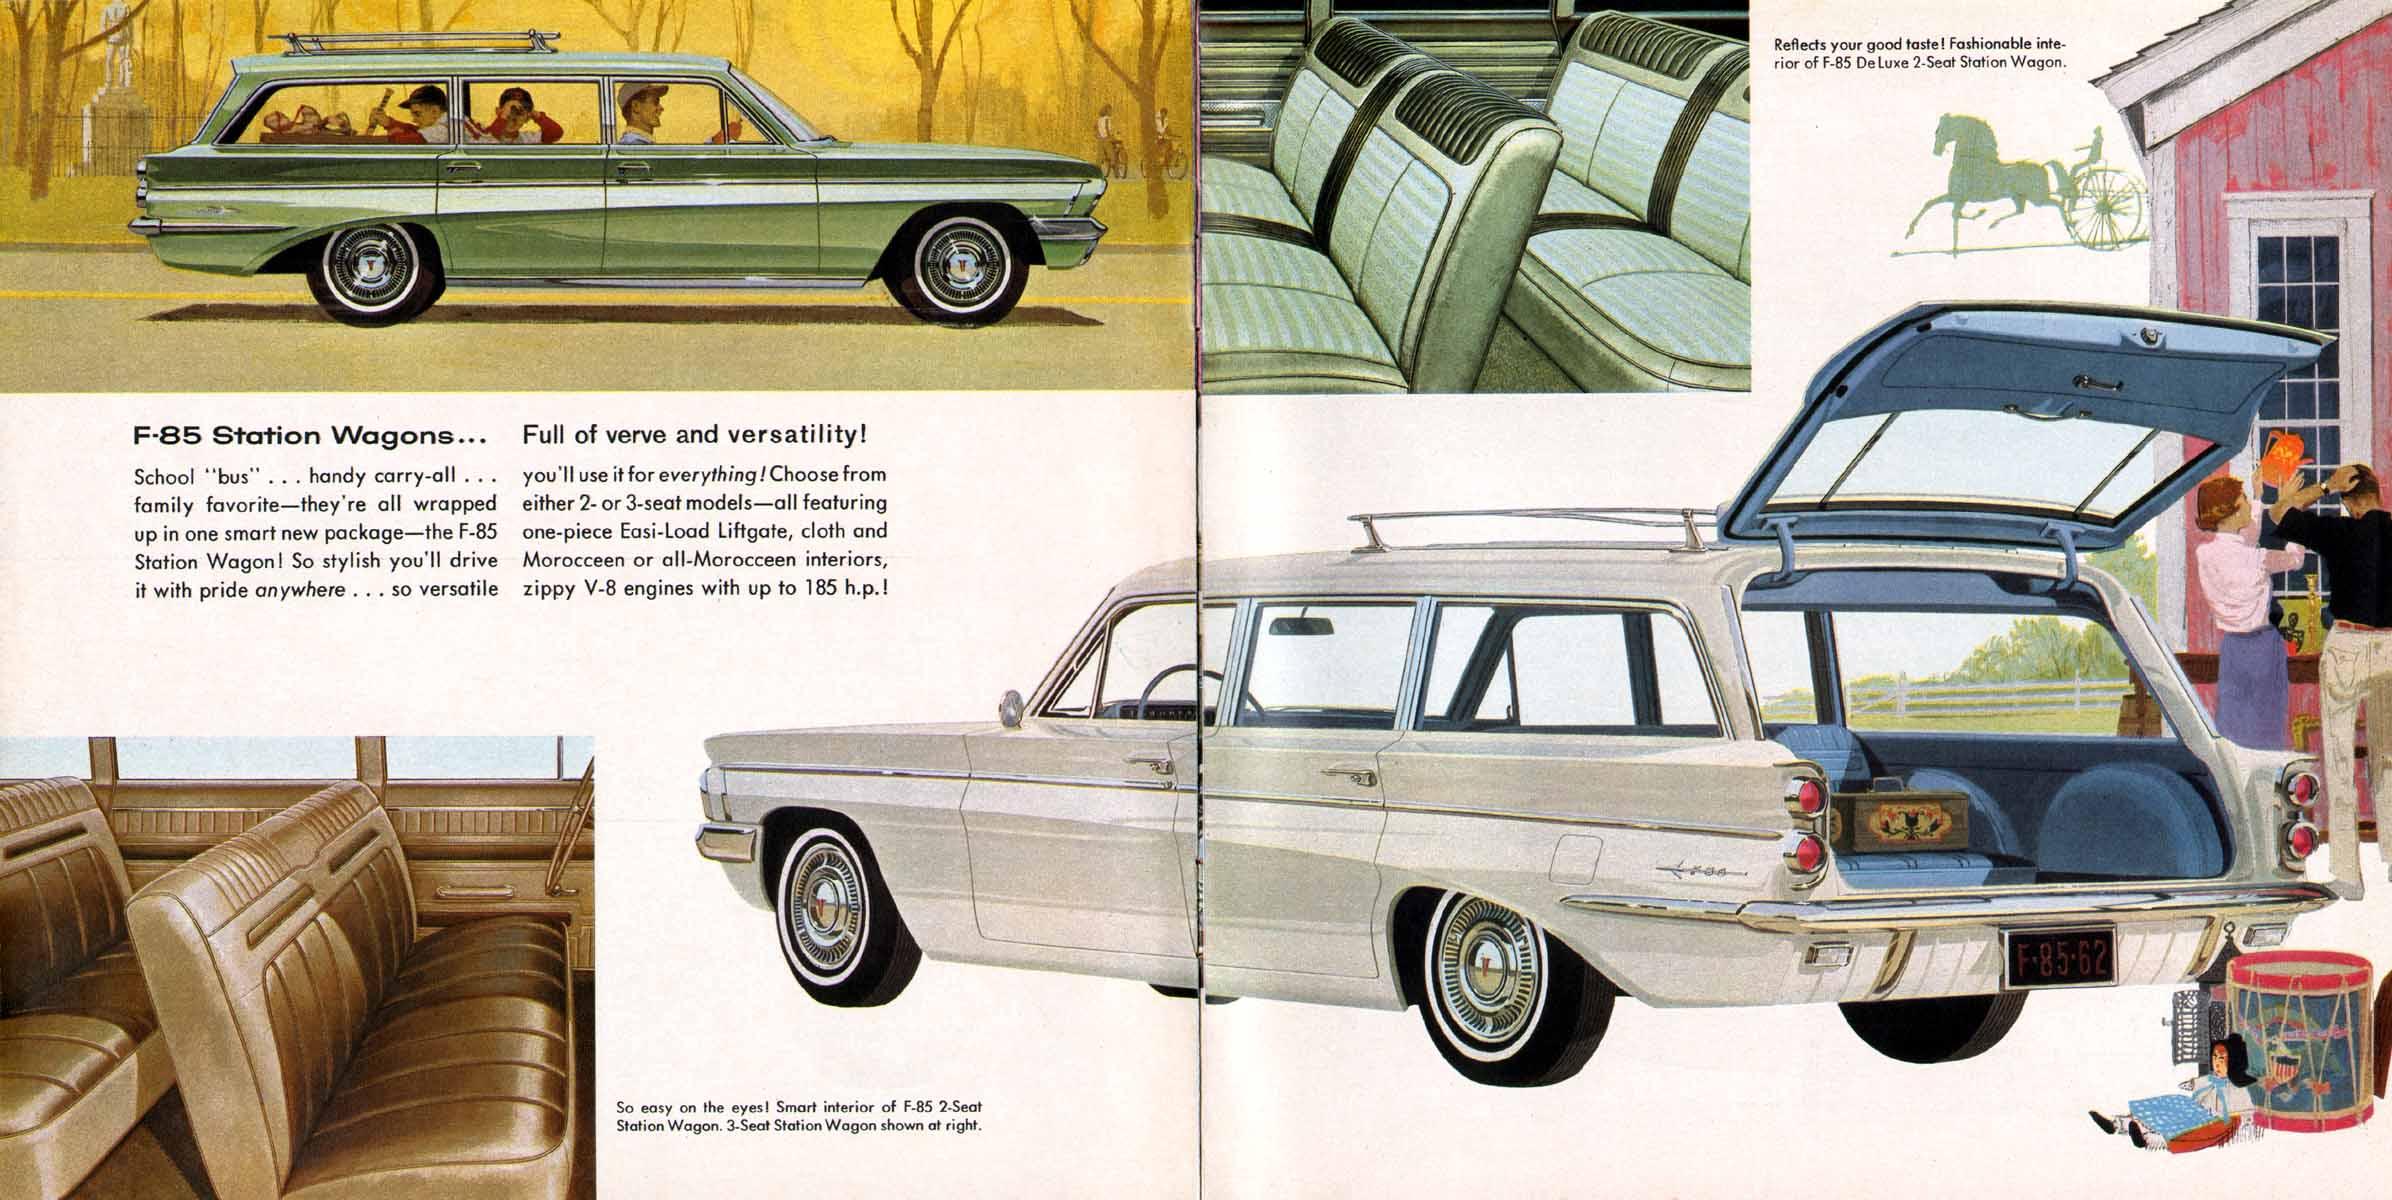 Directory Index: Oldsmobile/1962 Oldsmobile/album_003